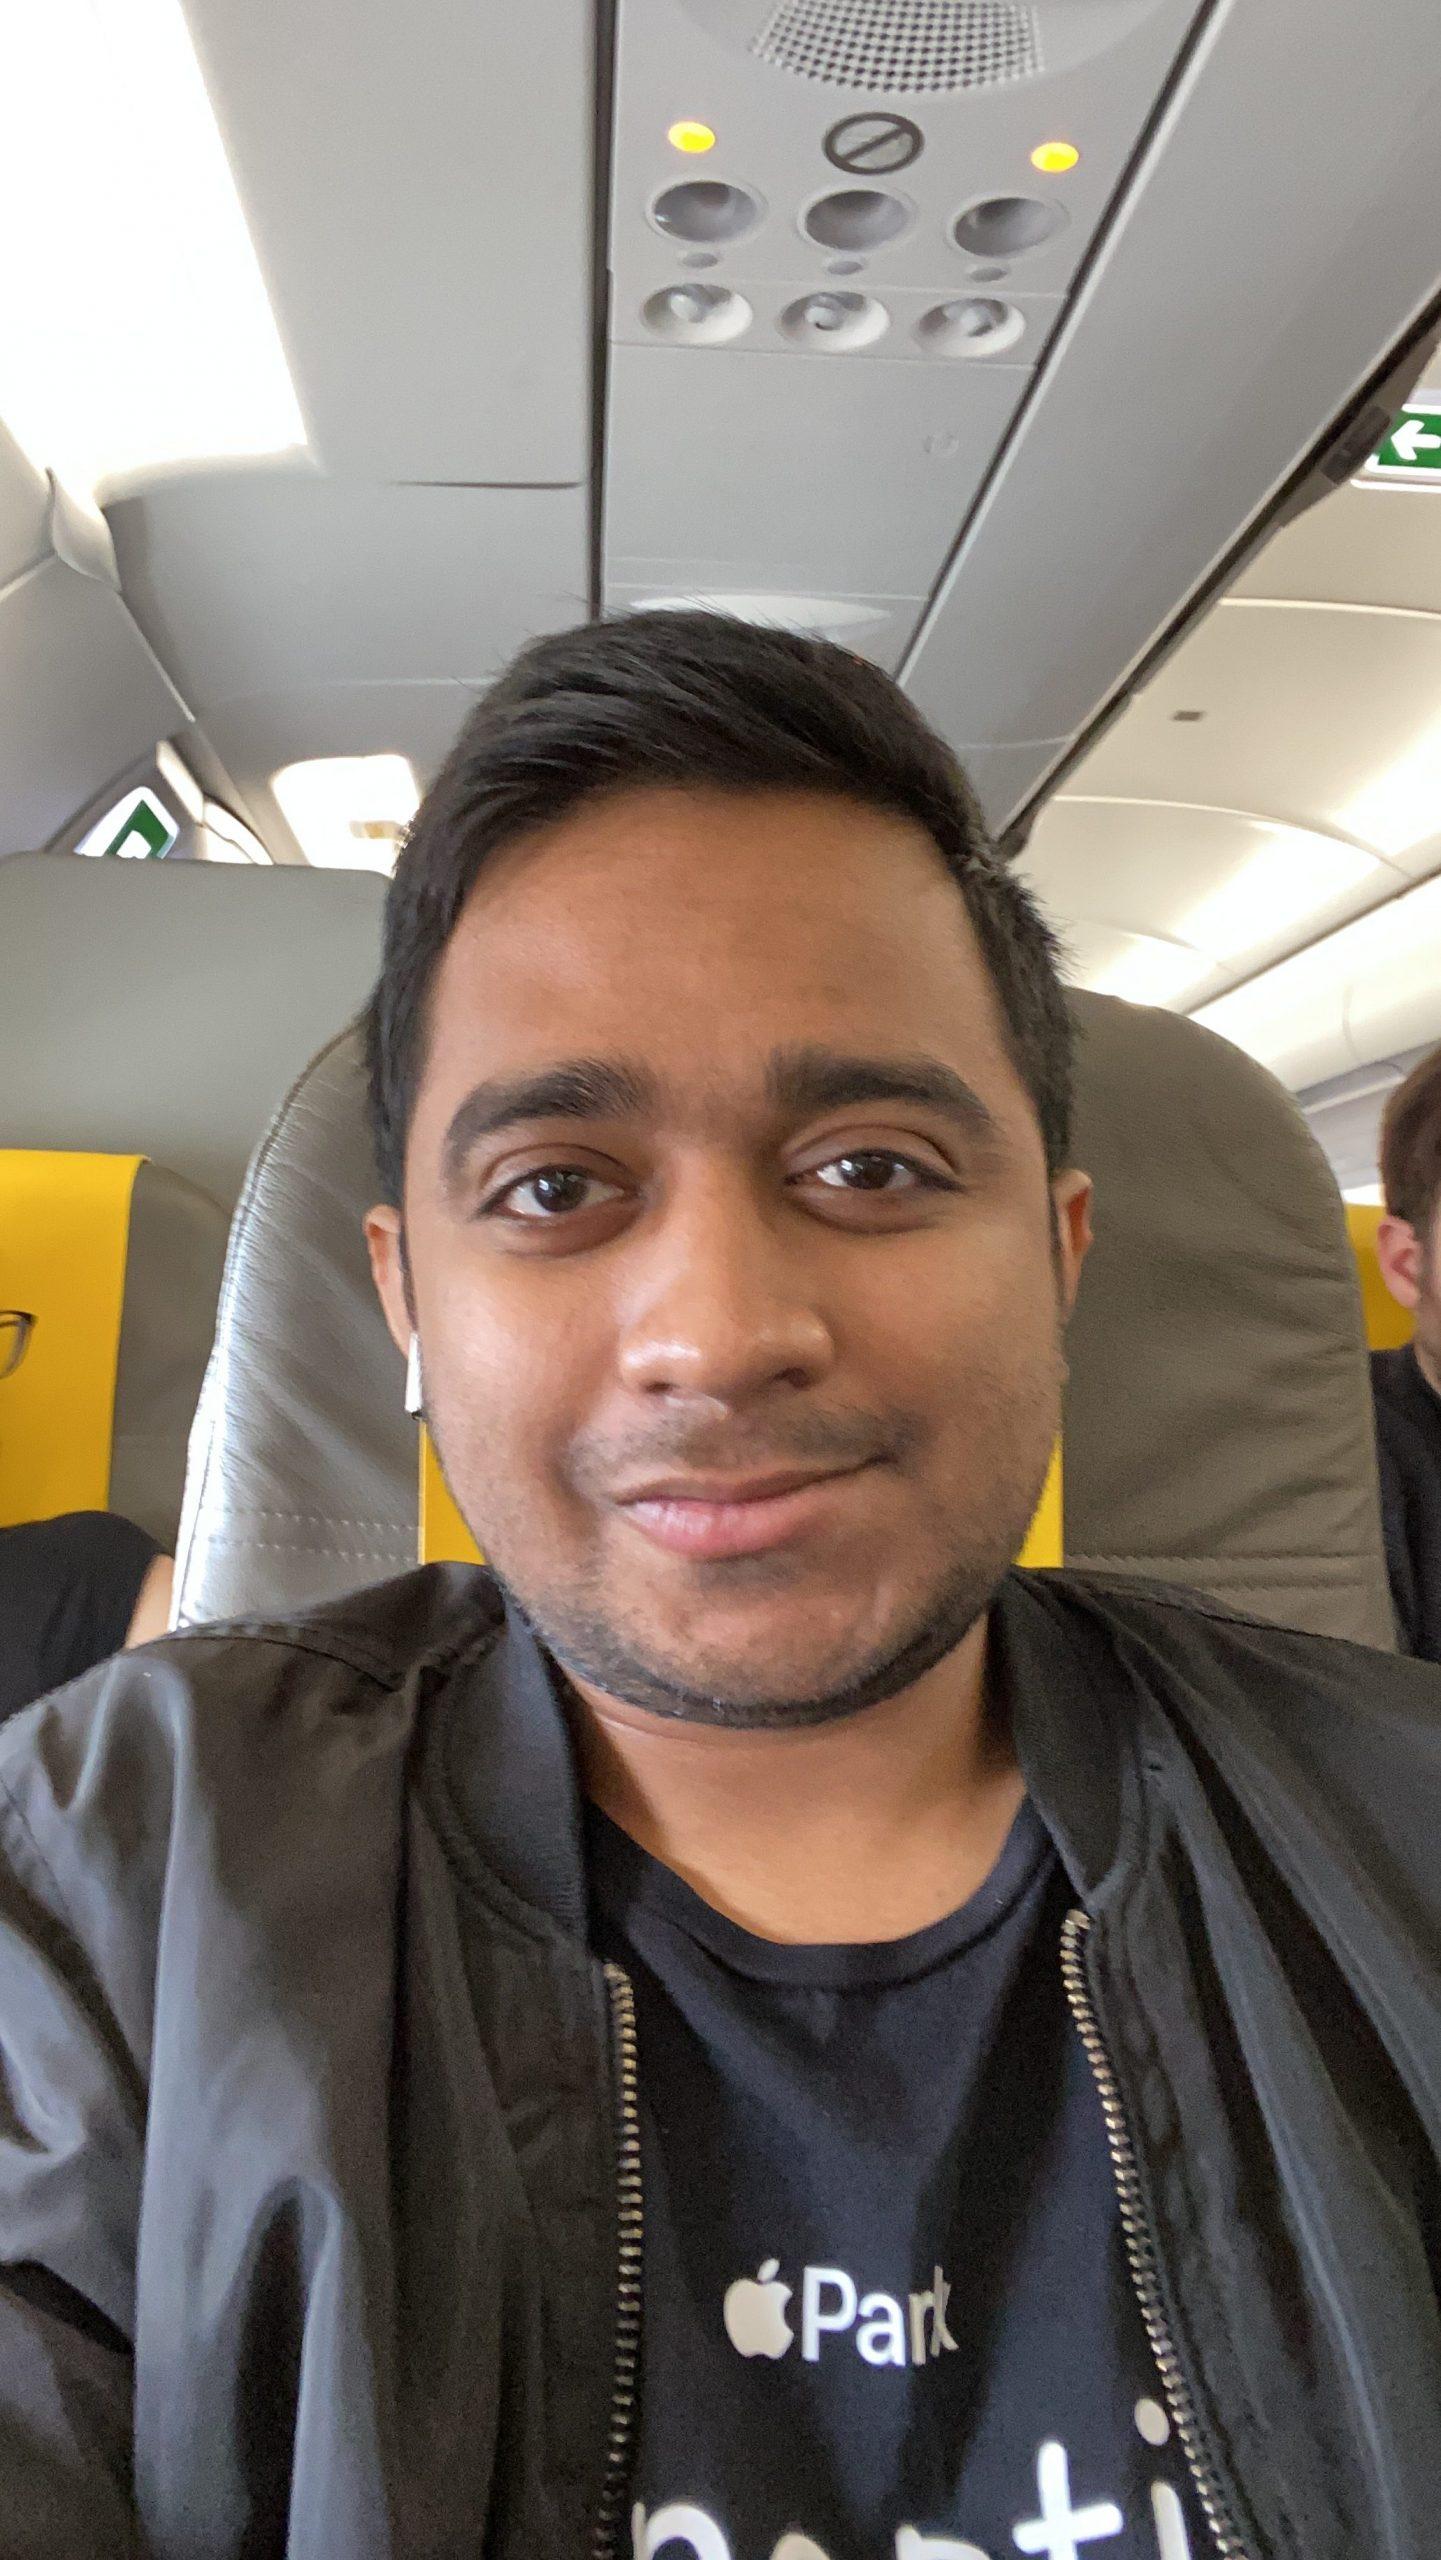 Ram Kumar - Repatriation flight. Ram on a plane